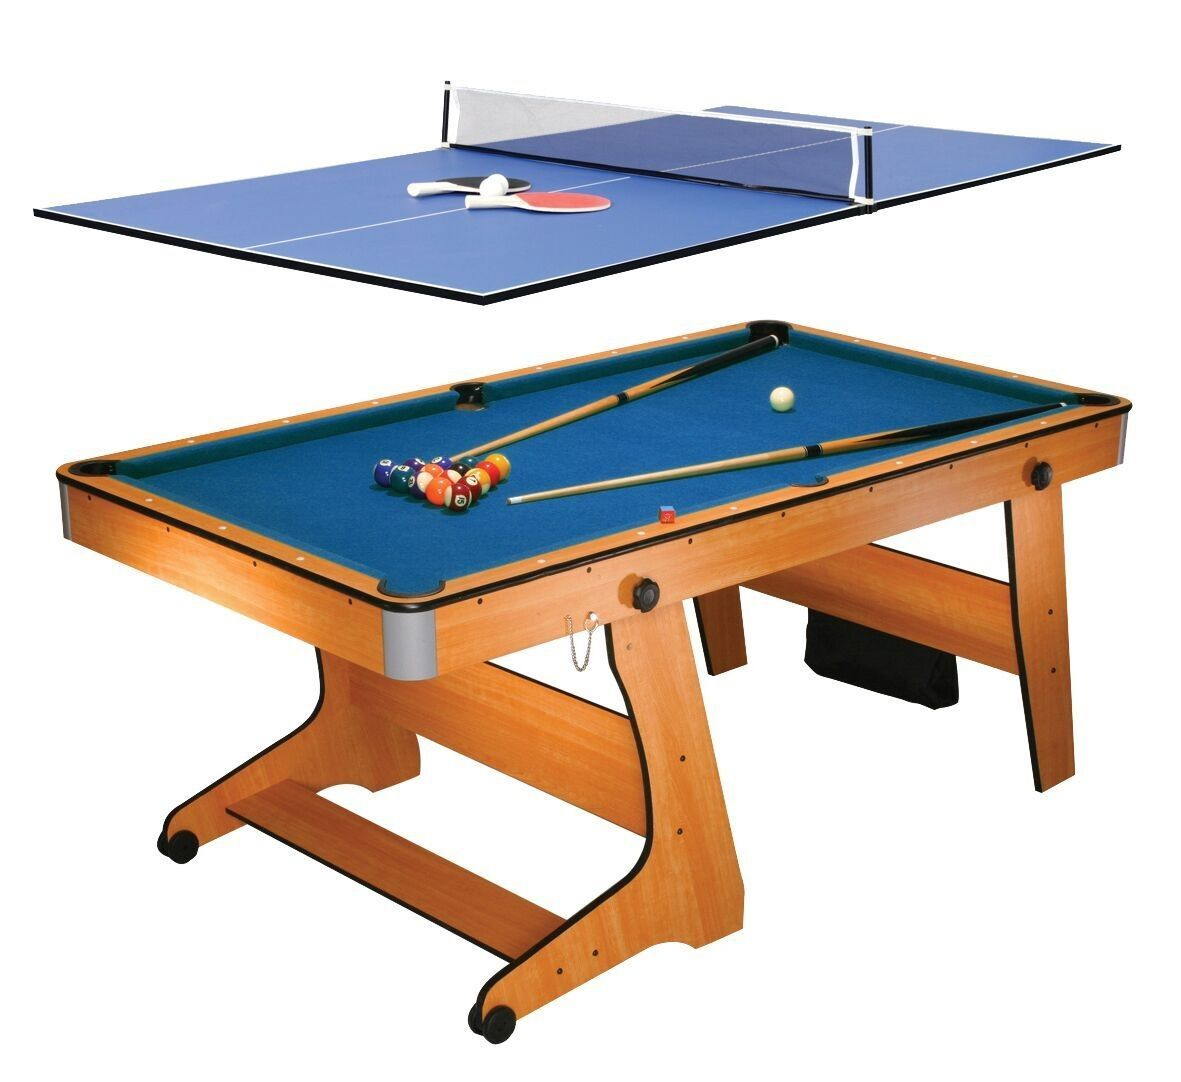 Fp6tt Folding Pool Table Tennis Table Folding Pool Tables Wotever In 2020 Folding Pool Table Pool Table Table Tennis